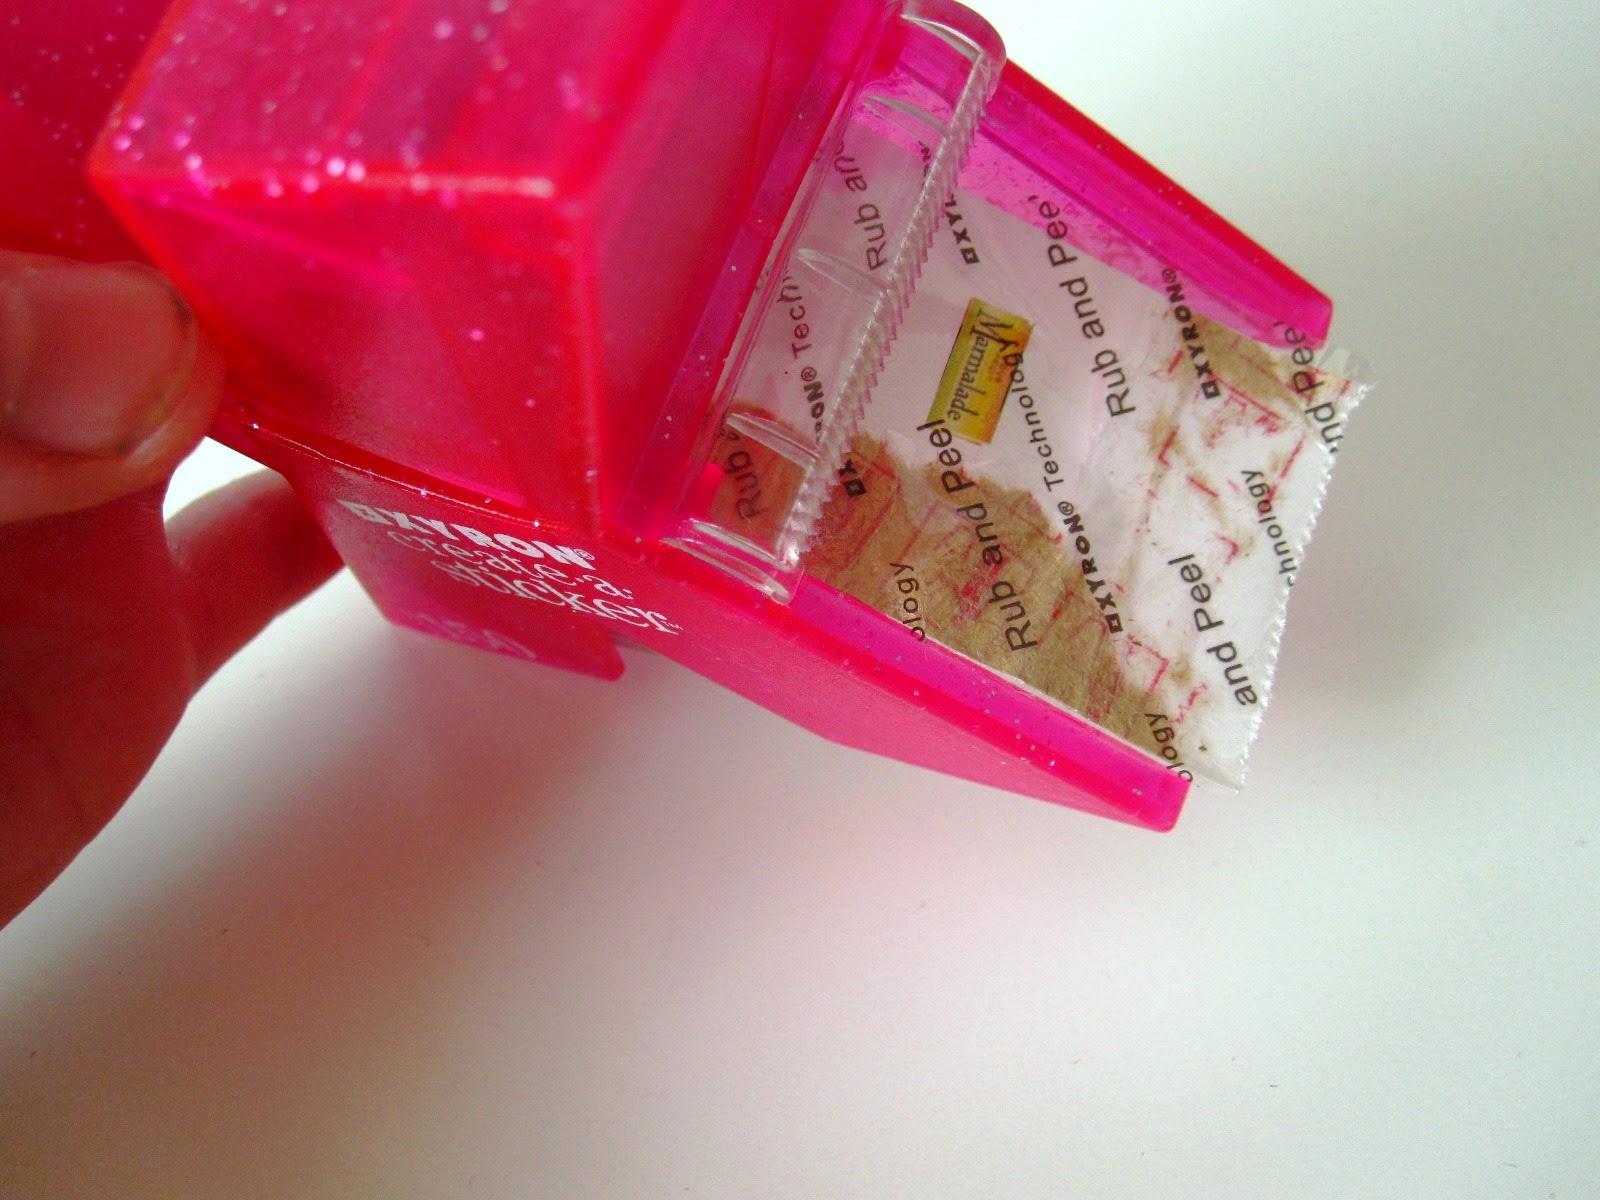 A Xyron 150 Create-a-Sticker machine with a dolls' house miniature marmalade jar label turned into a sticker.